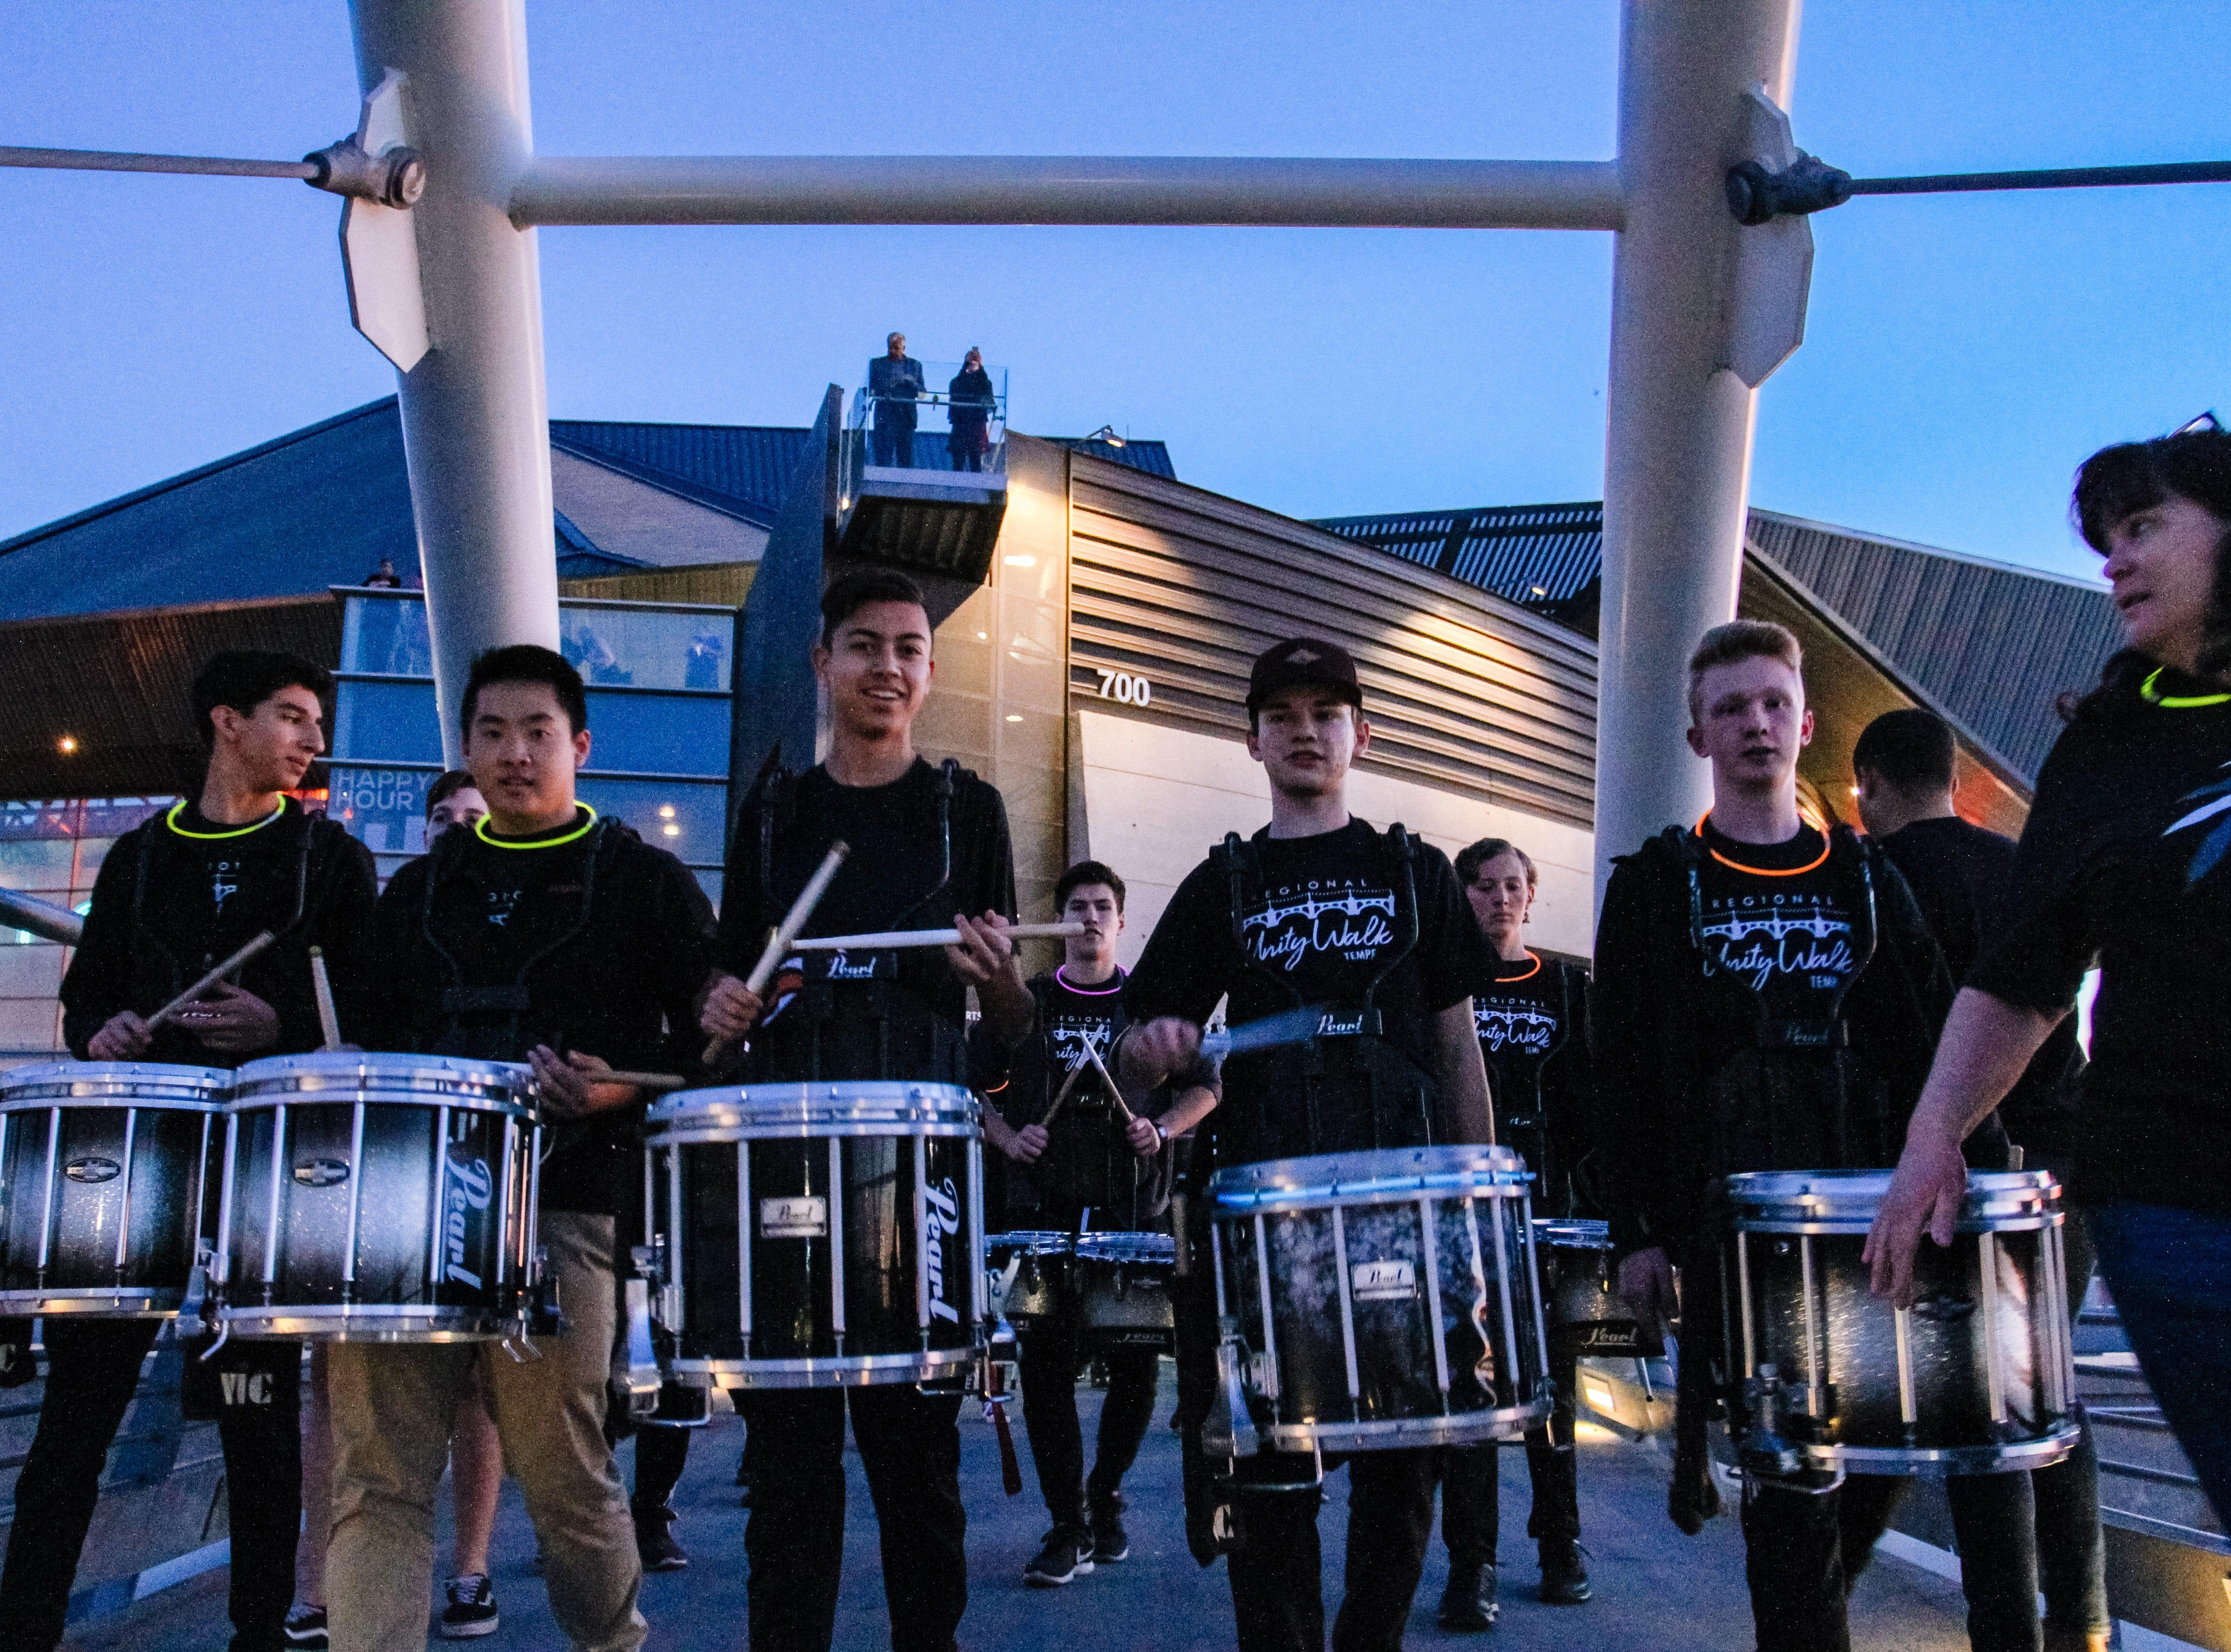 The Corona del Sol band leads the Unity Walk 2019 at Tempe Beach Park, in Tempe, Arizona on Saturday, Jan. 26, 2019.